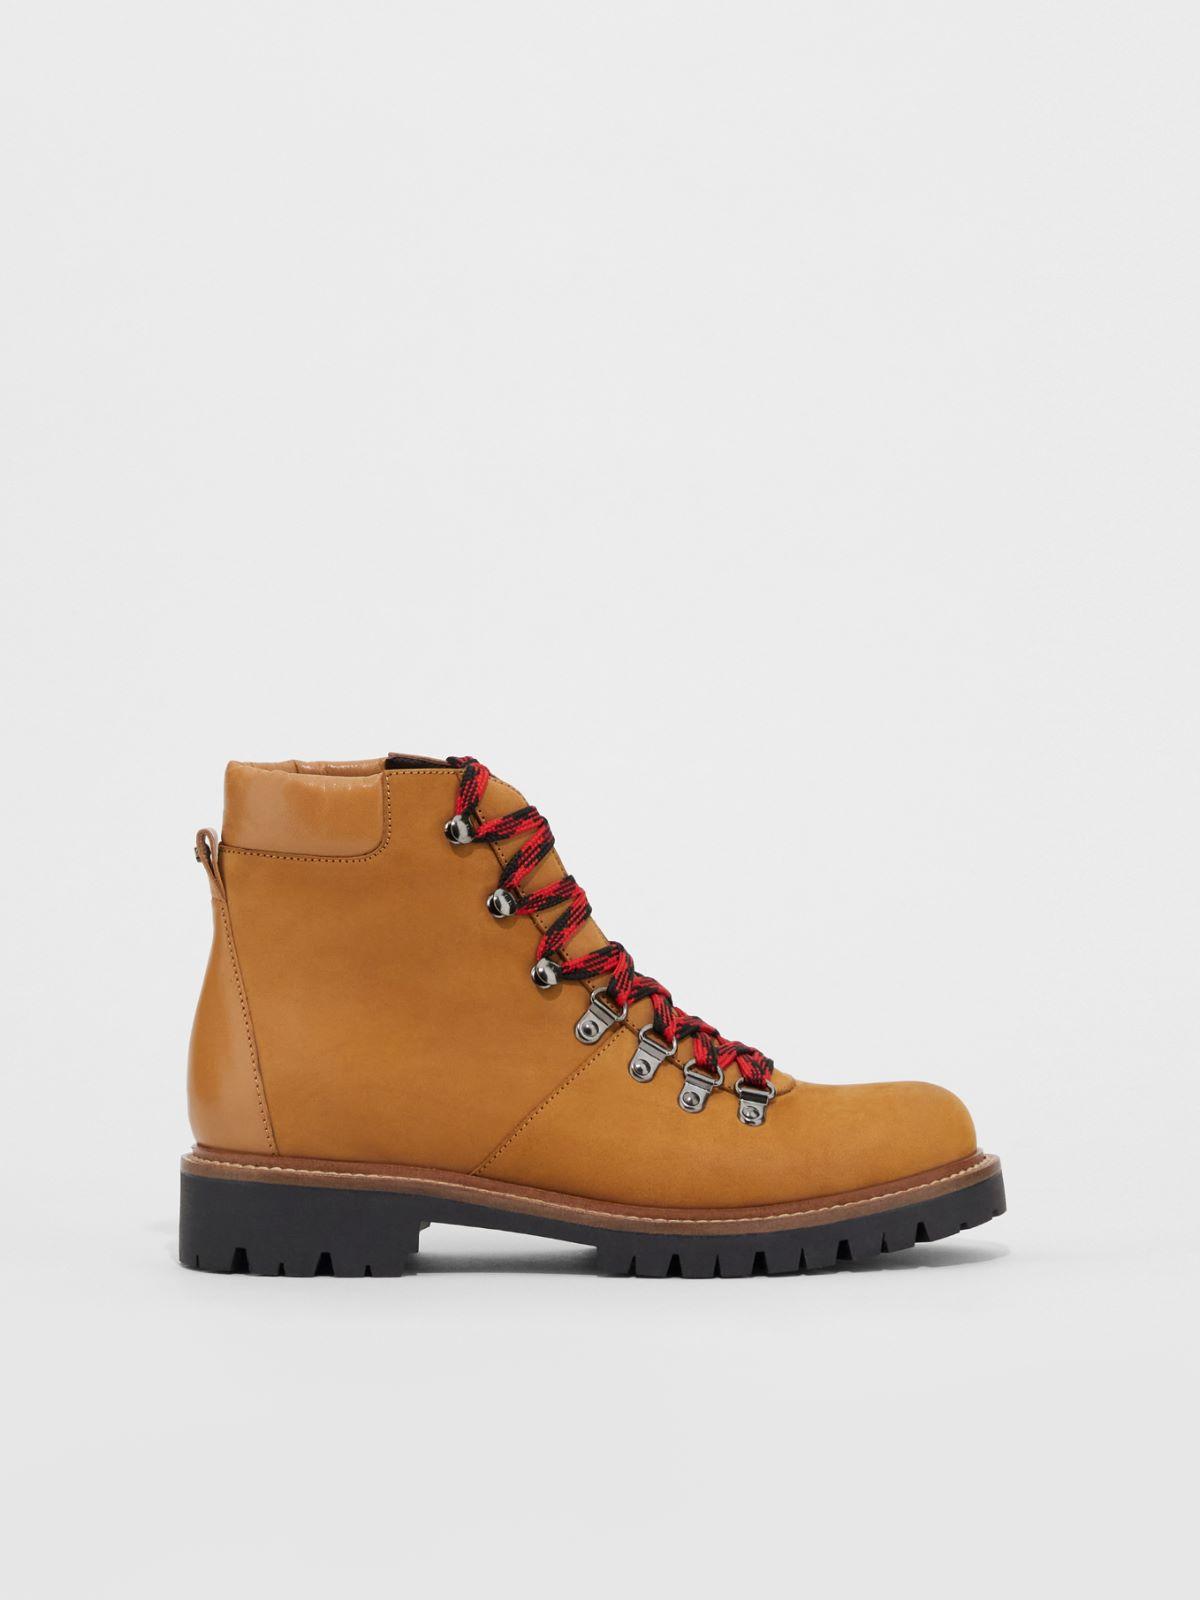 Waterproof nubuck leather hiking boots Weekend Maxmara